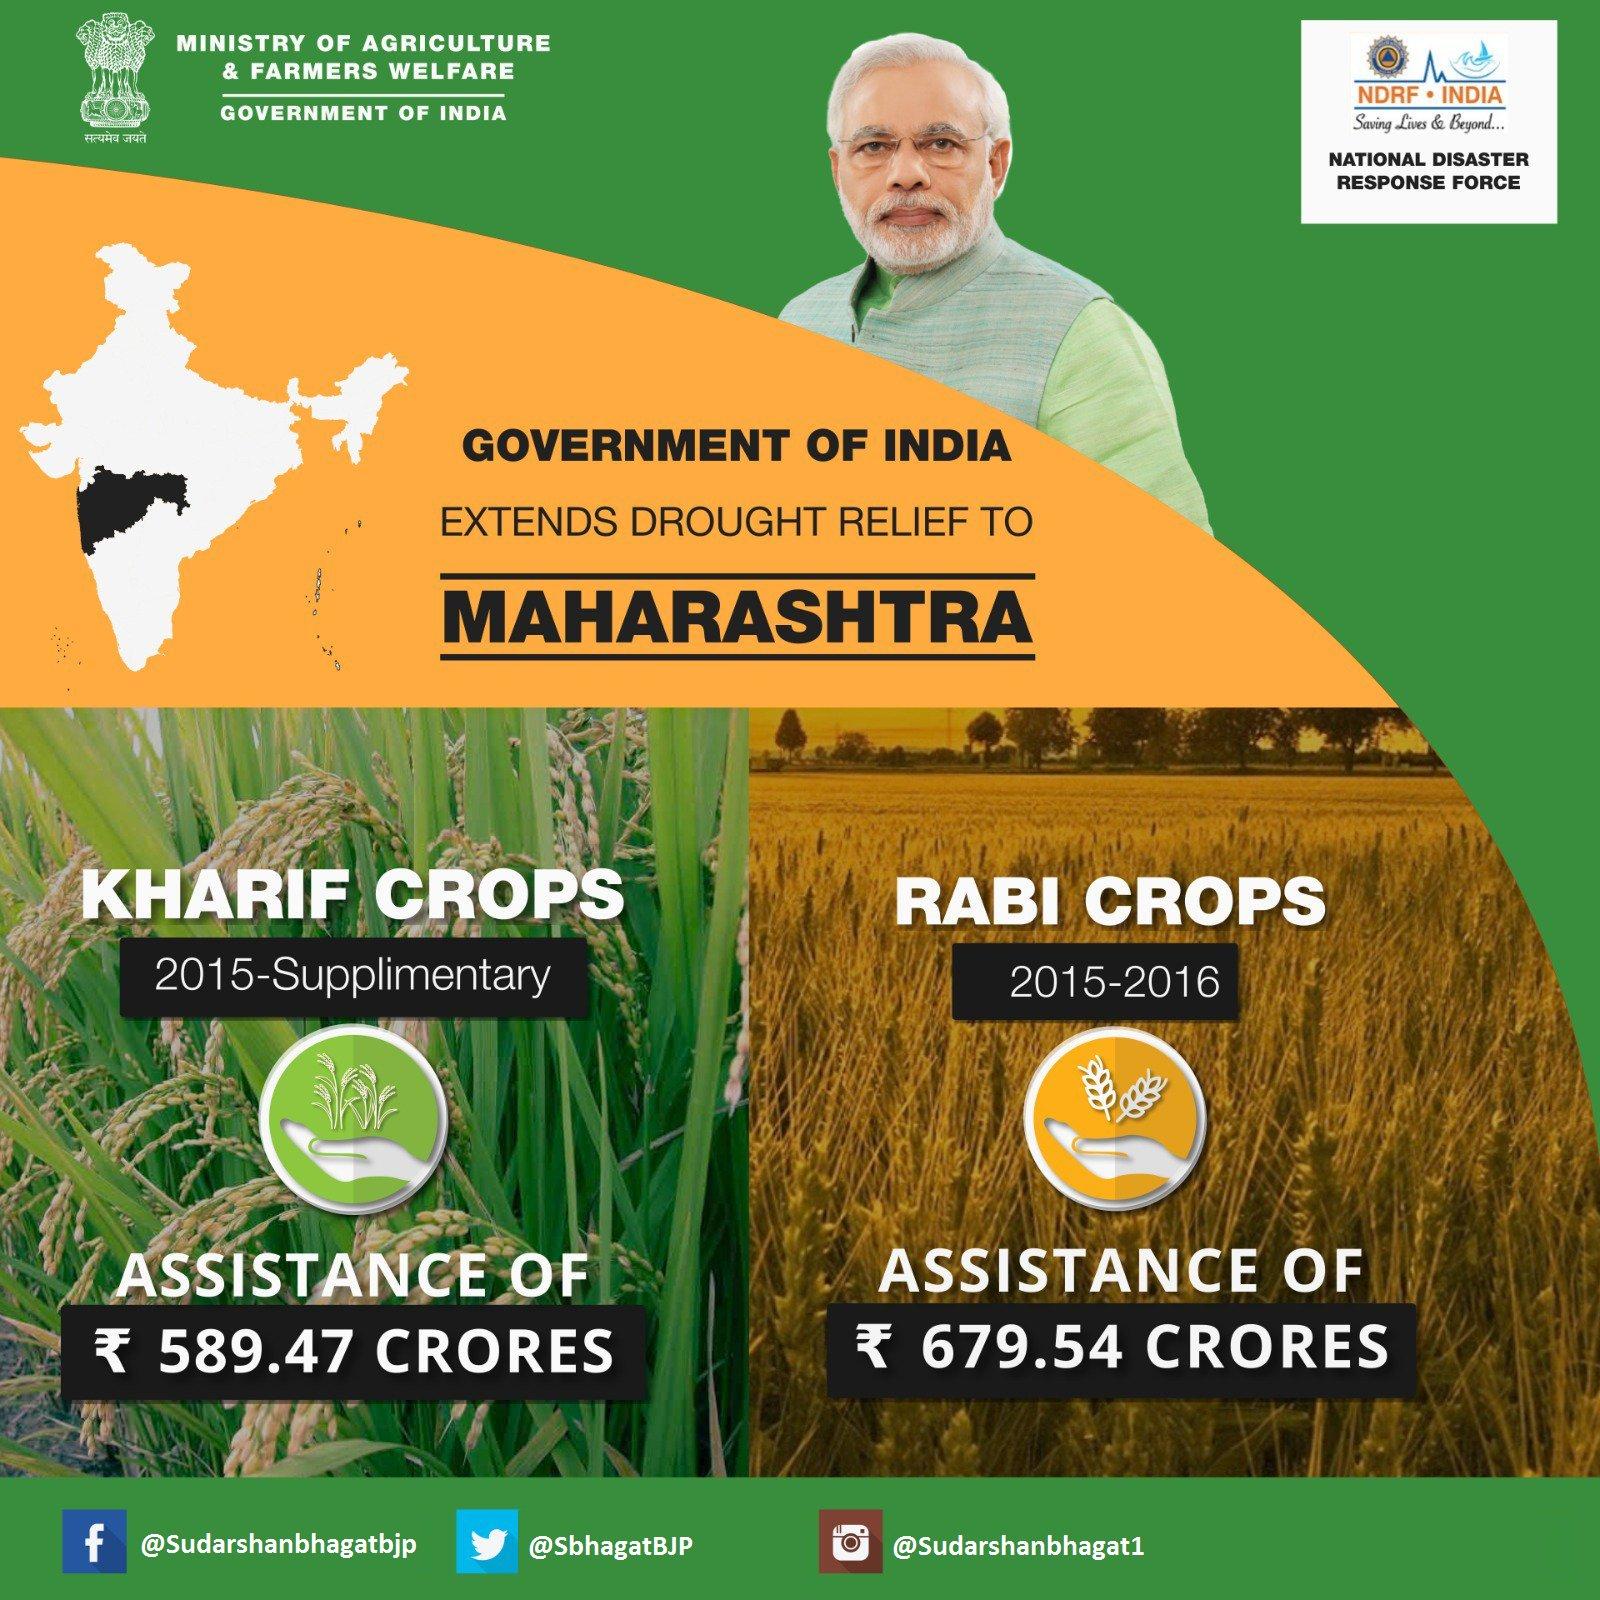 Government of #India extends drought relief to Maharashtra. #TransformingIndia @Dev_Fadnavis @CMOMaharashtra https://t.co/nFcSKahBZm